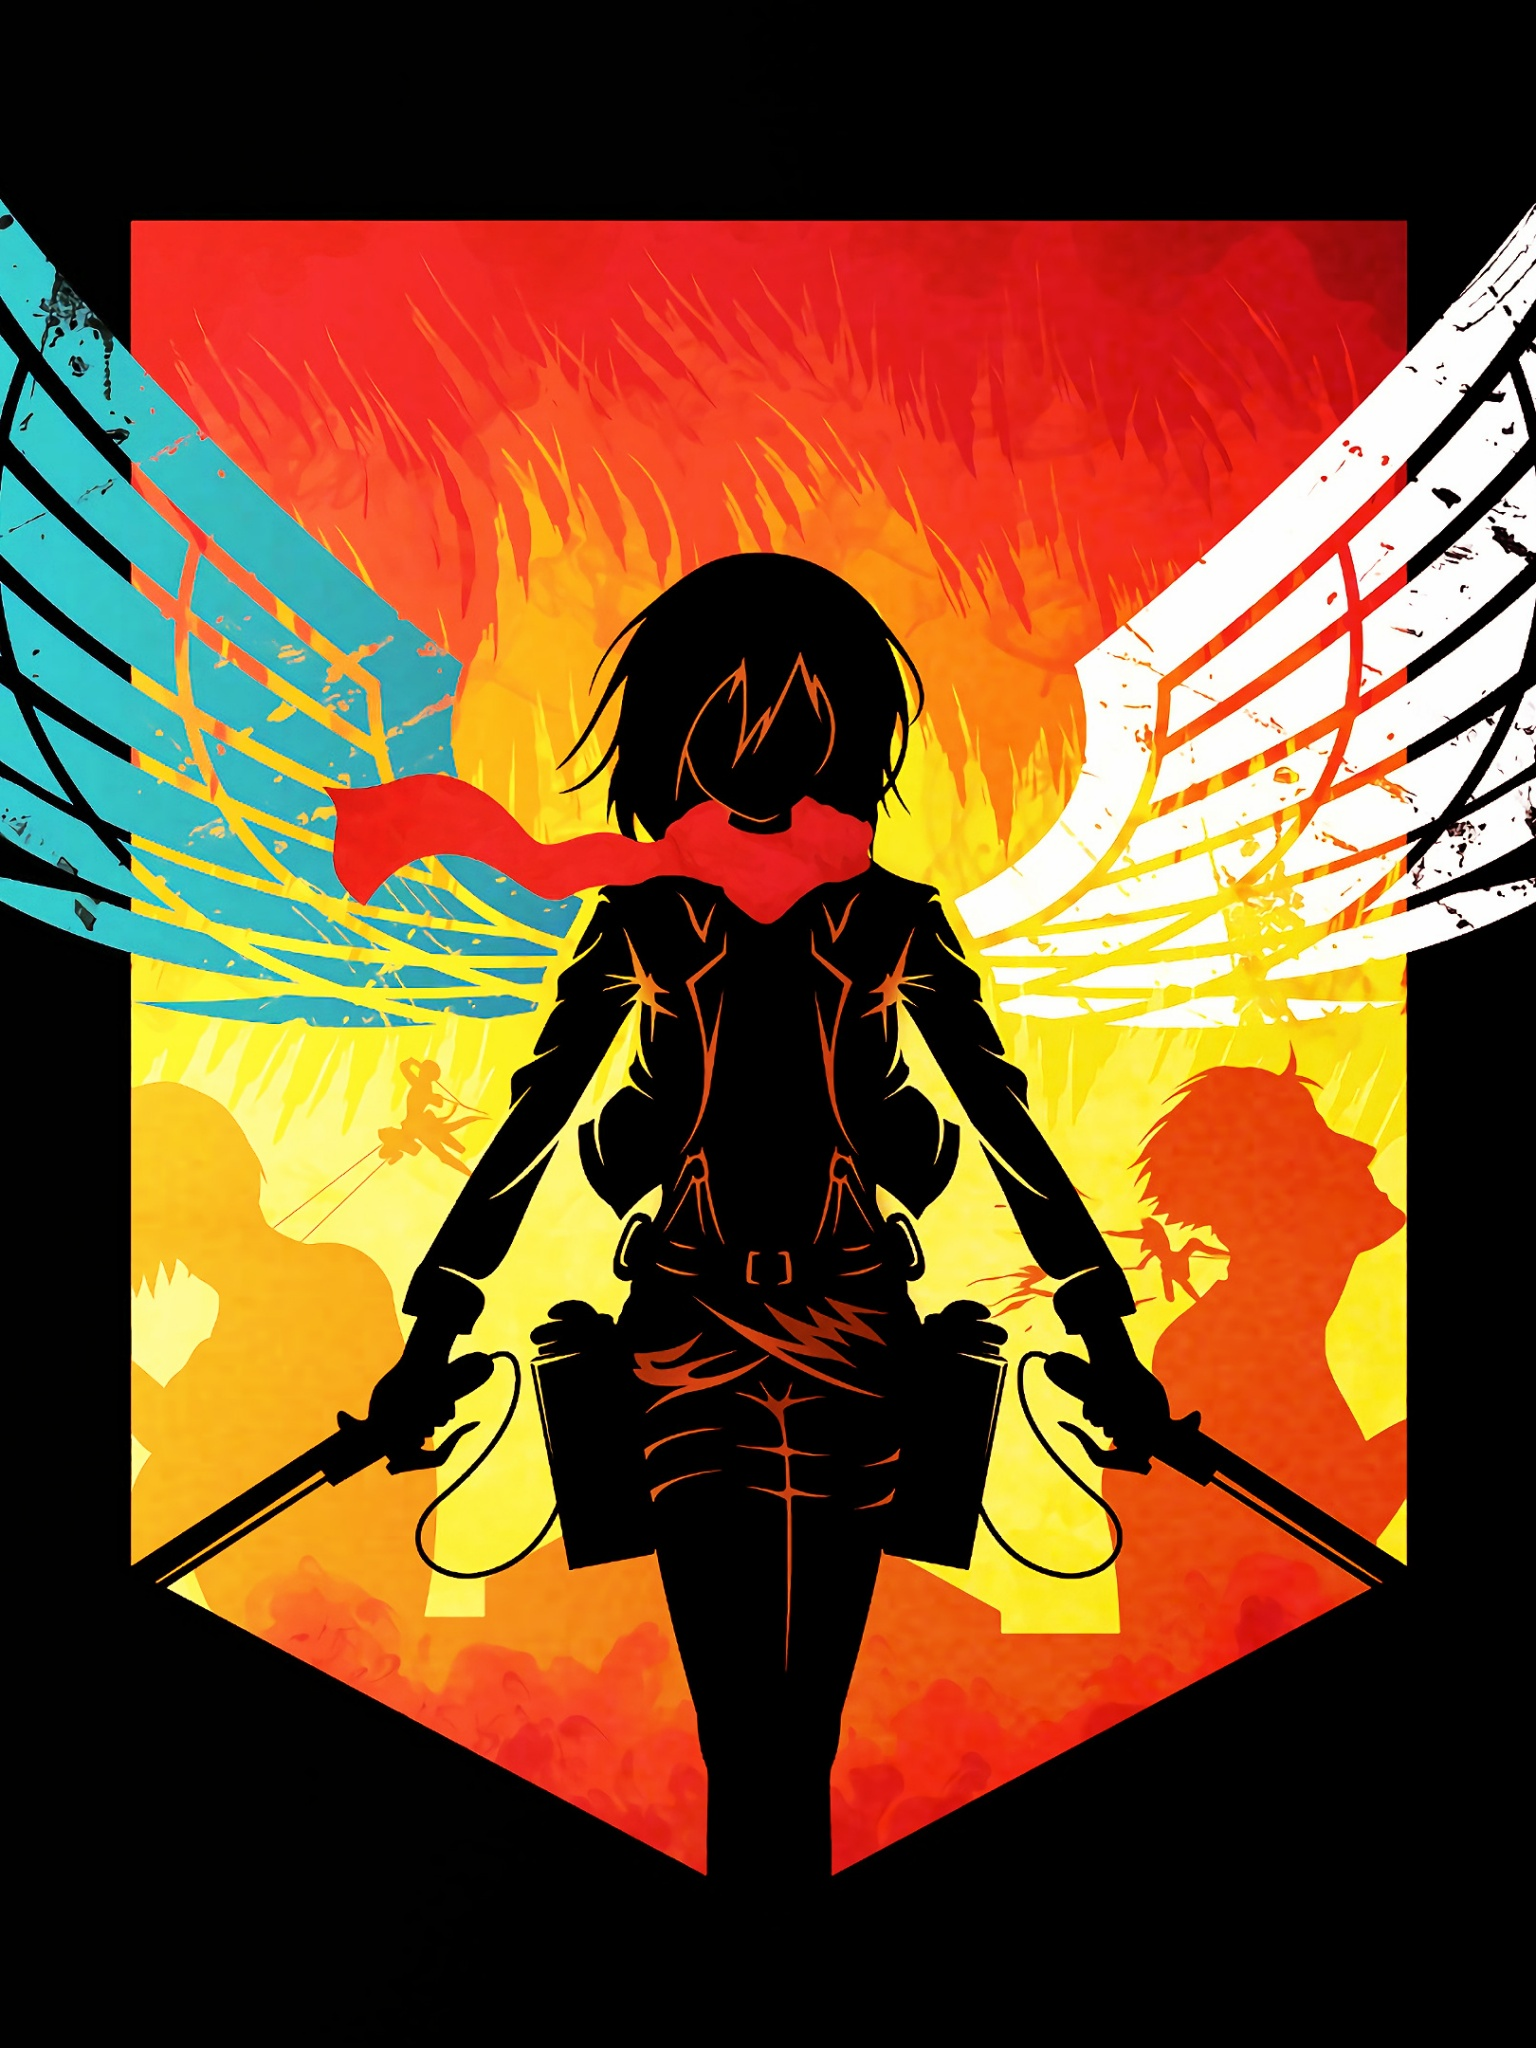 Attack On Titan 4k Wallpaper Shingeki No Kyojin Mikasa Ackerman Anime Series Season 3 Graphics Cgi 2073